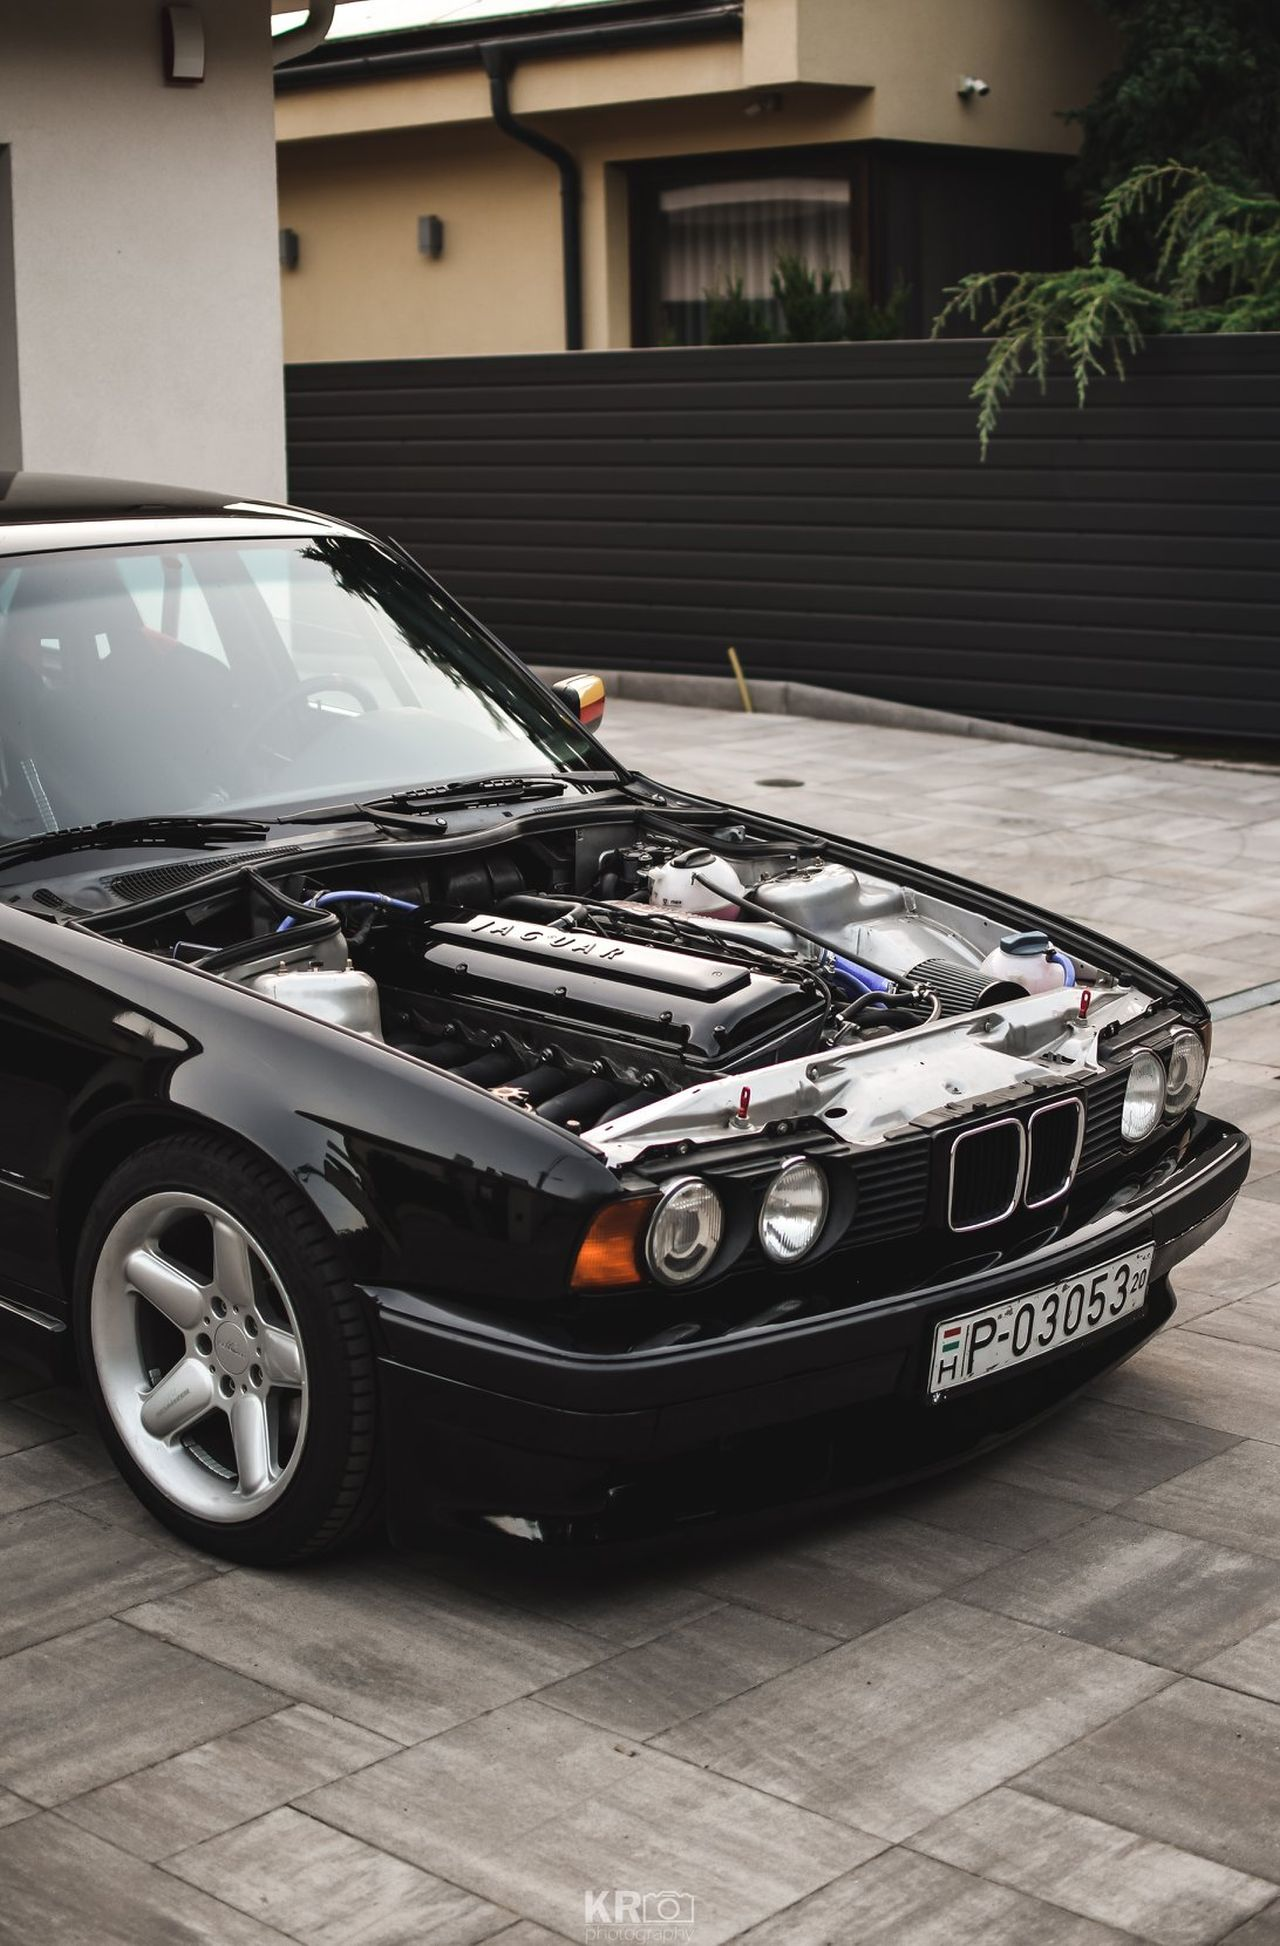 '94 BMW 540i E34 - En 6 en ligne compressé so British ! 35